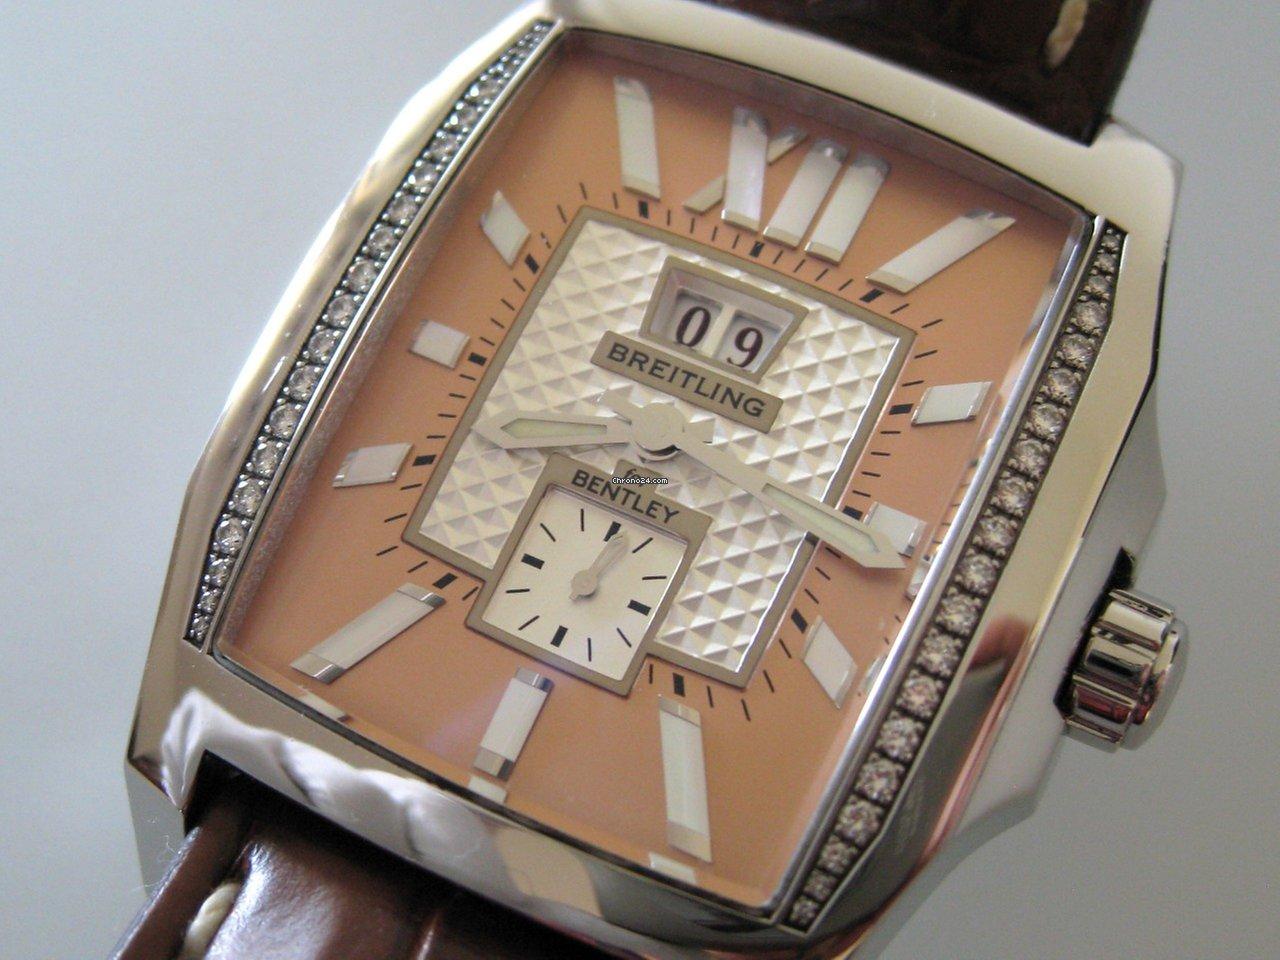 7a0a2722838 Breitling Bentley Flying B - Todos os preços de relógios Breitling Bentley  Flying B na Chrono24